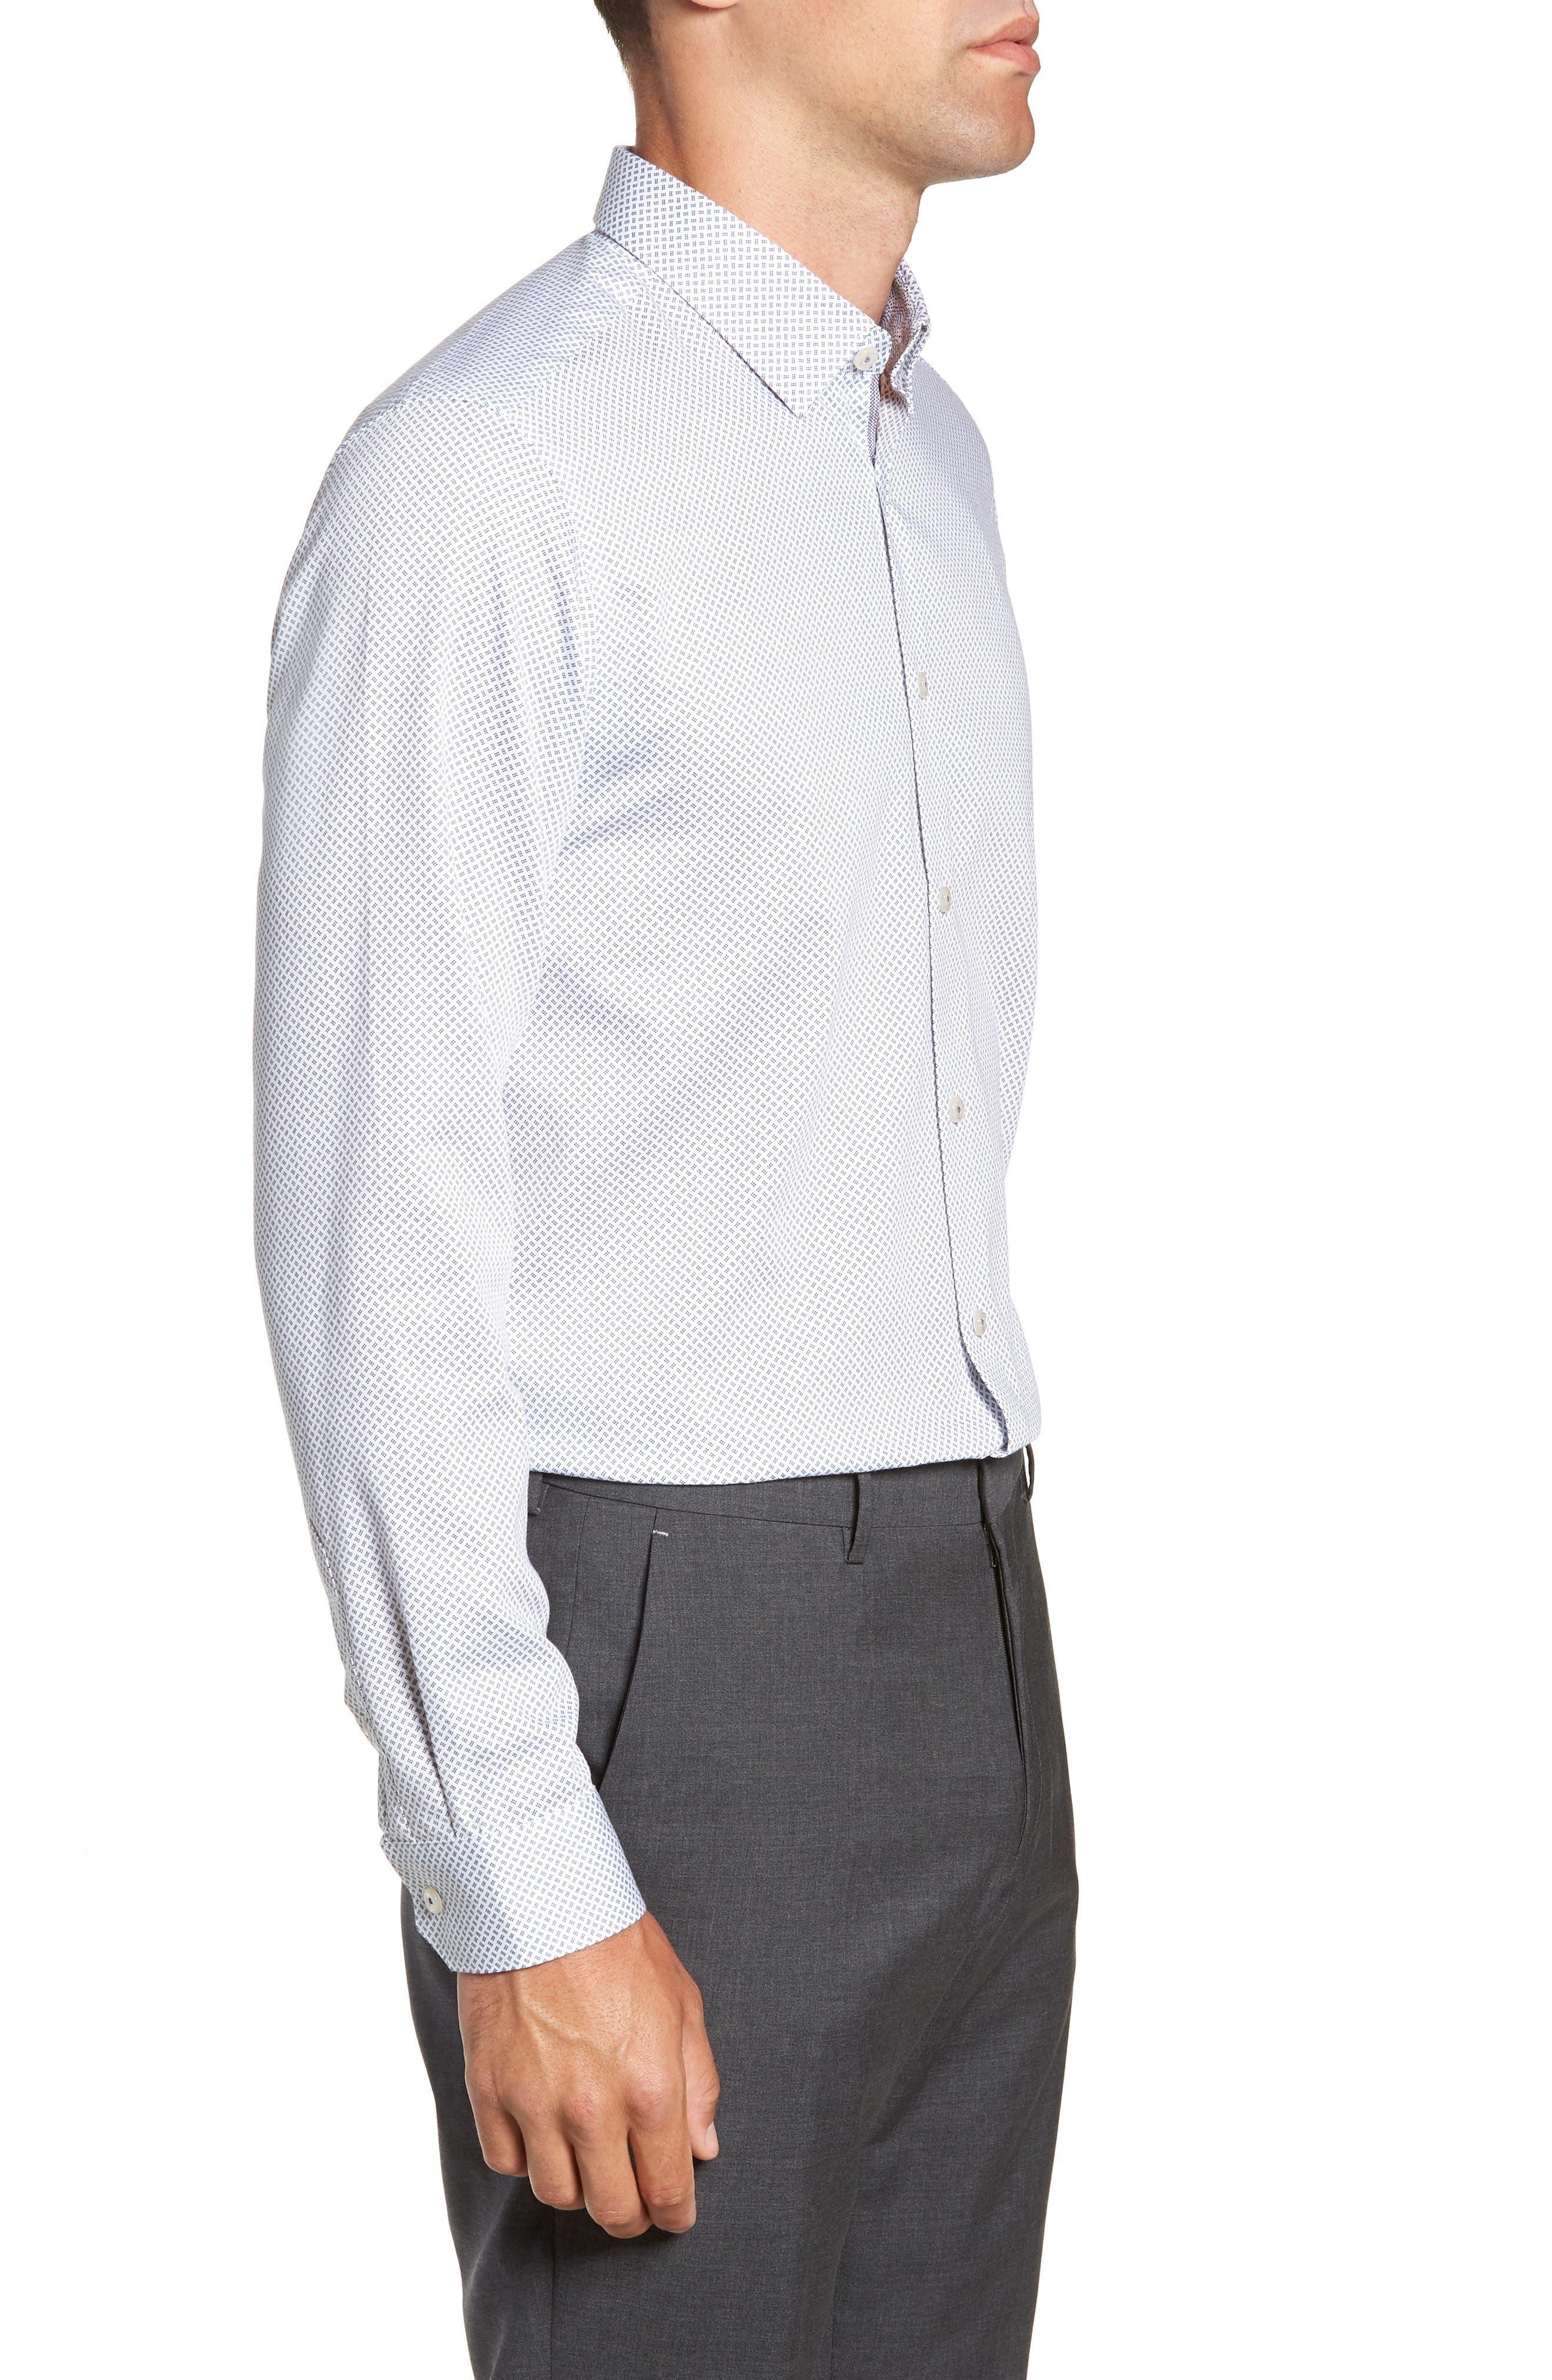 Aspara Modern Fit Geometric Dress Shirt,                             Alternate thumbnail 4, color,                             WHITE/ NAVY